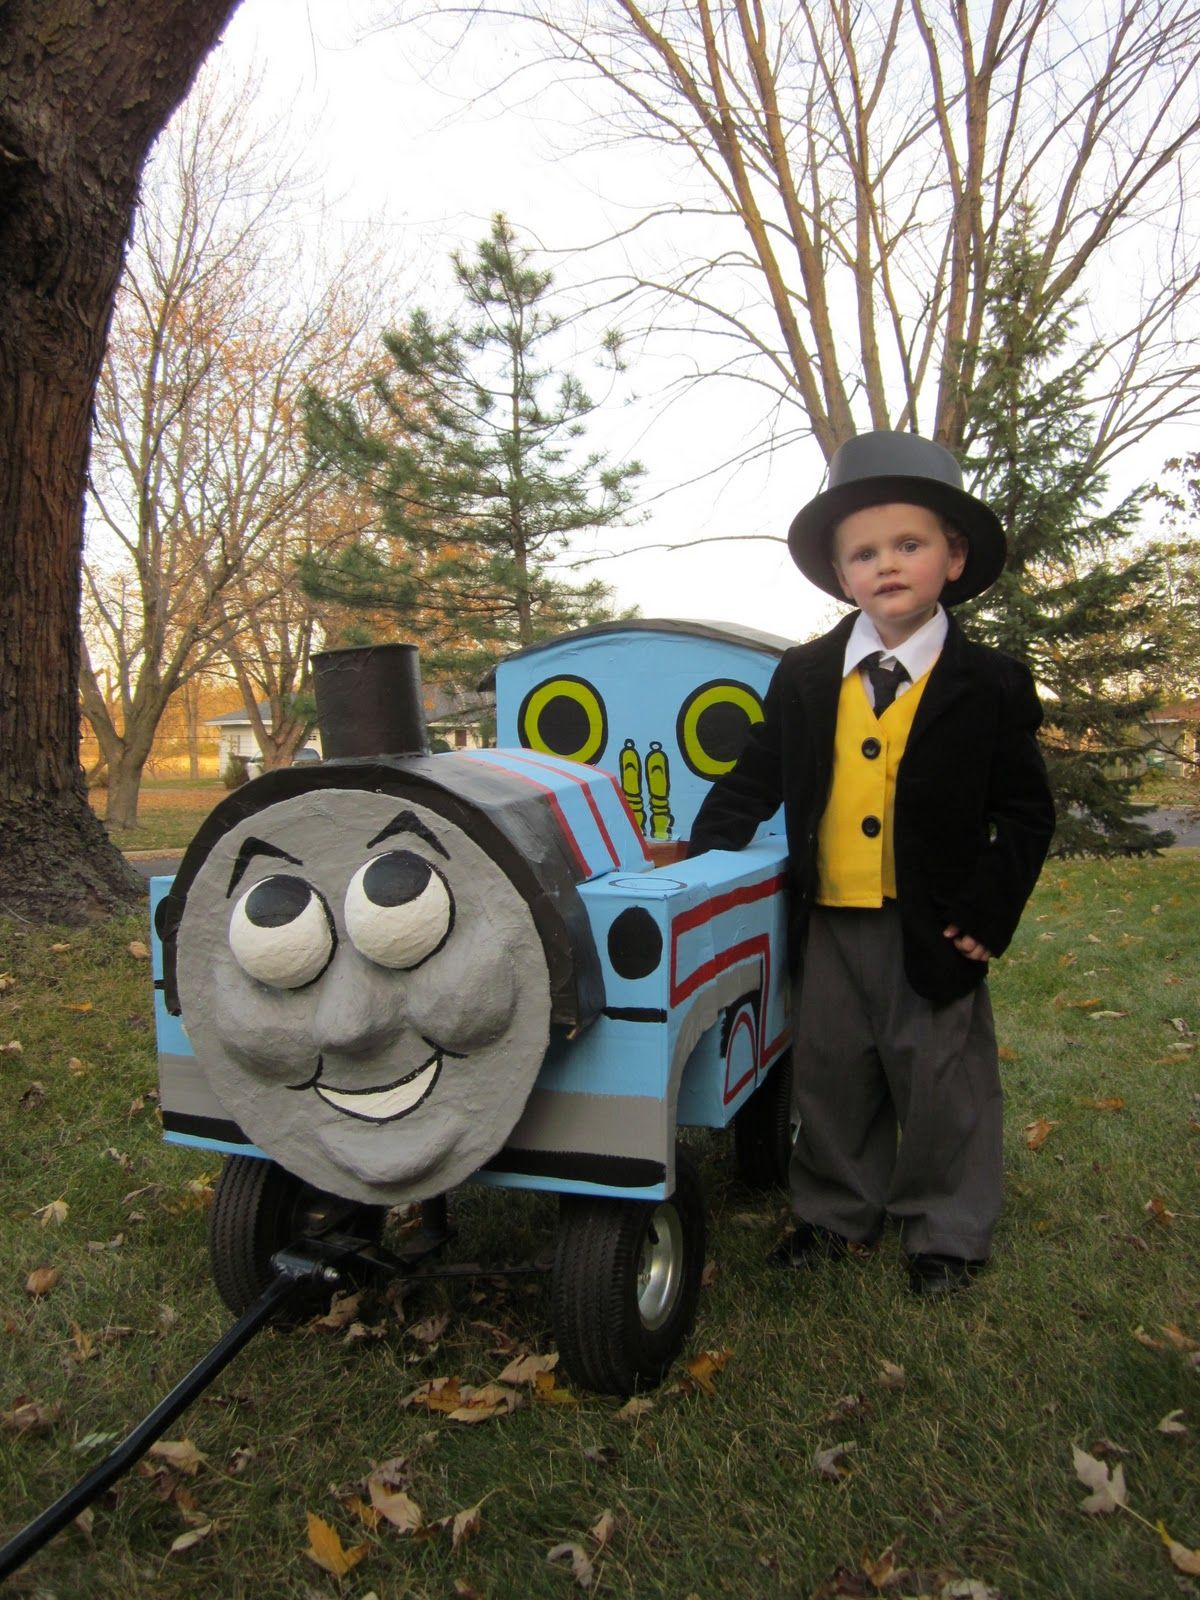 sir topham hatt costume & thomas wagonsoooo clever